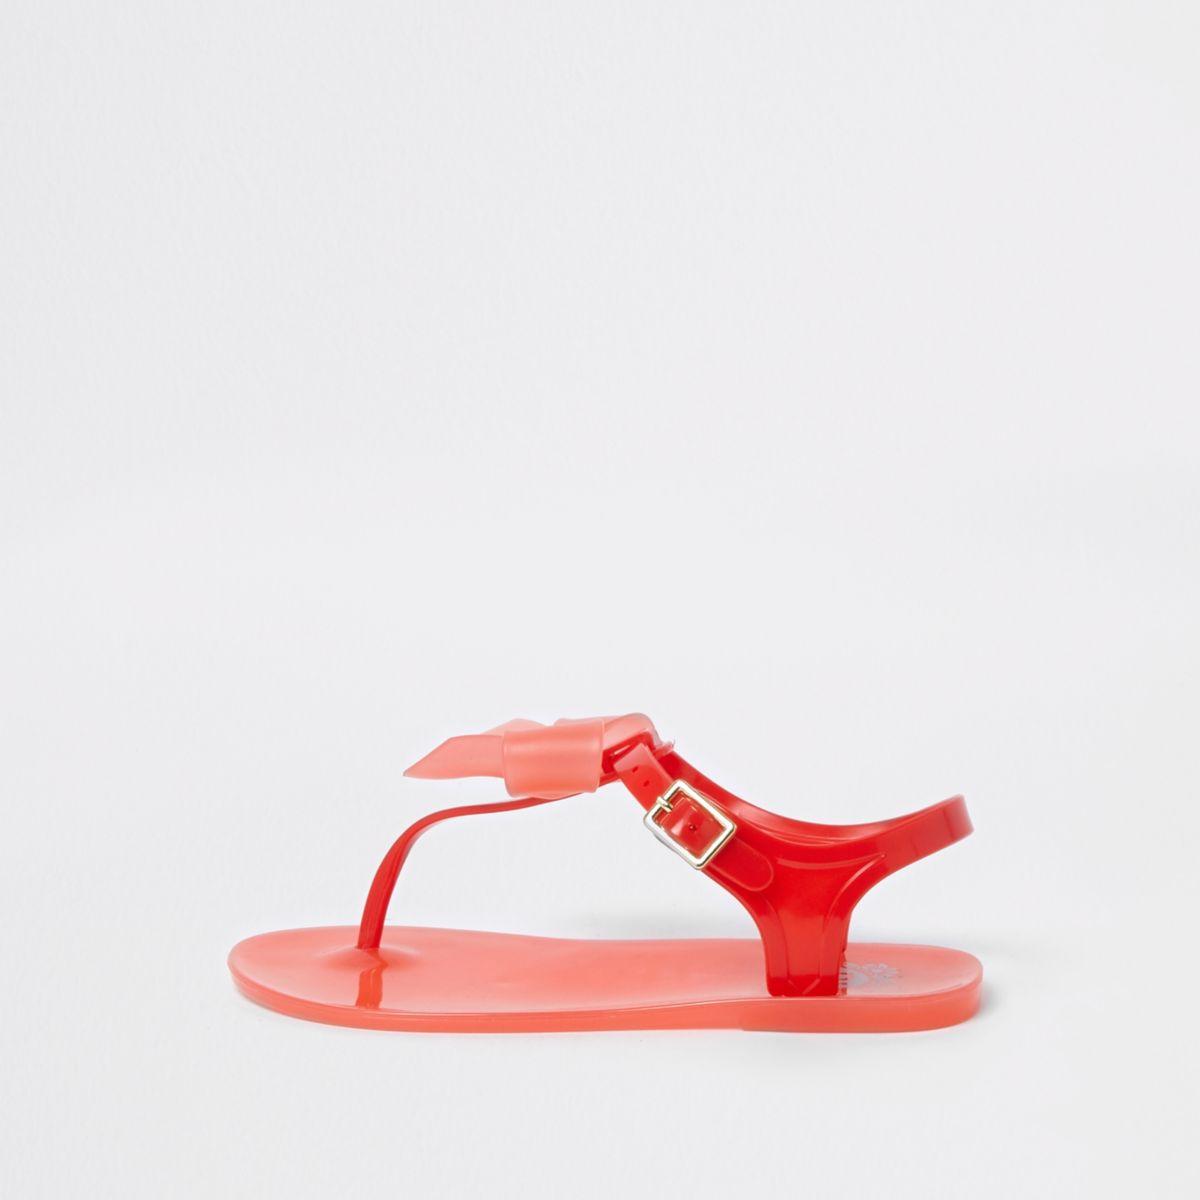 Girls red rhinestone bow jelly sandals